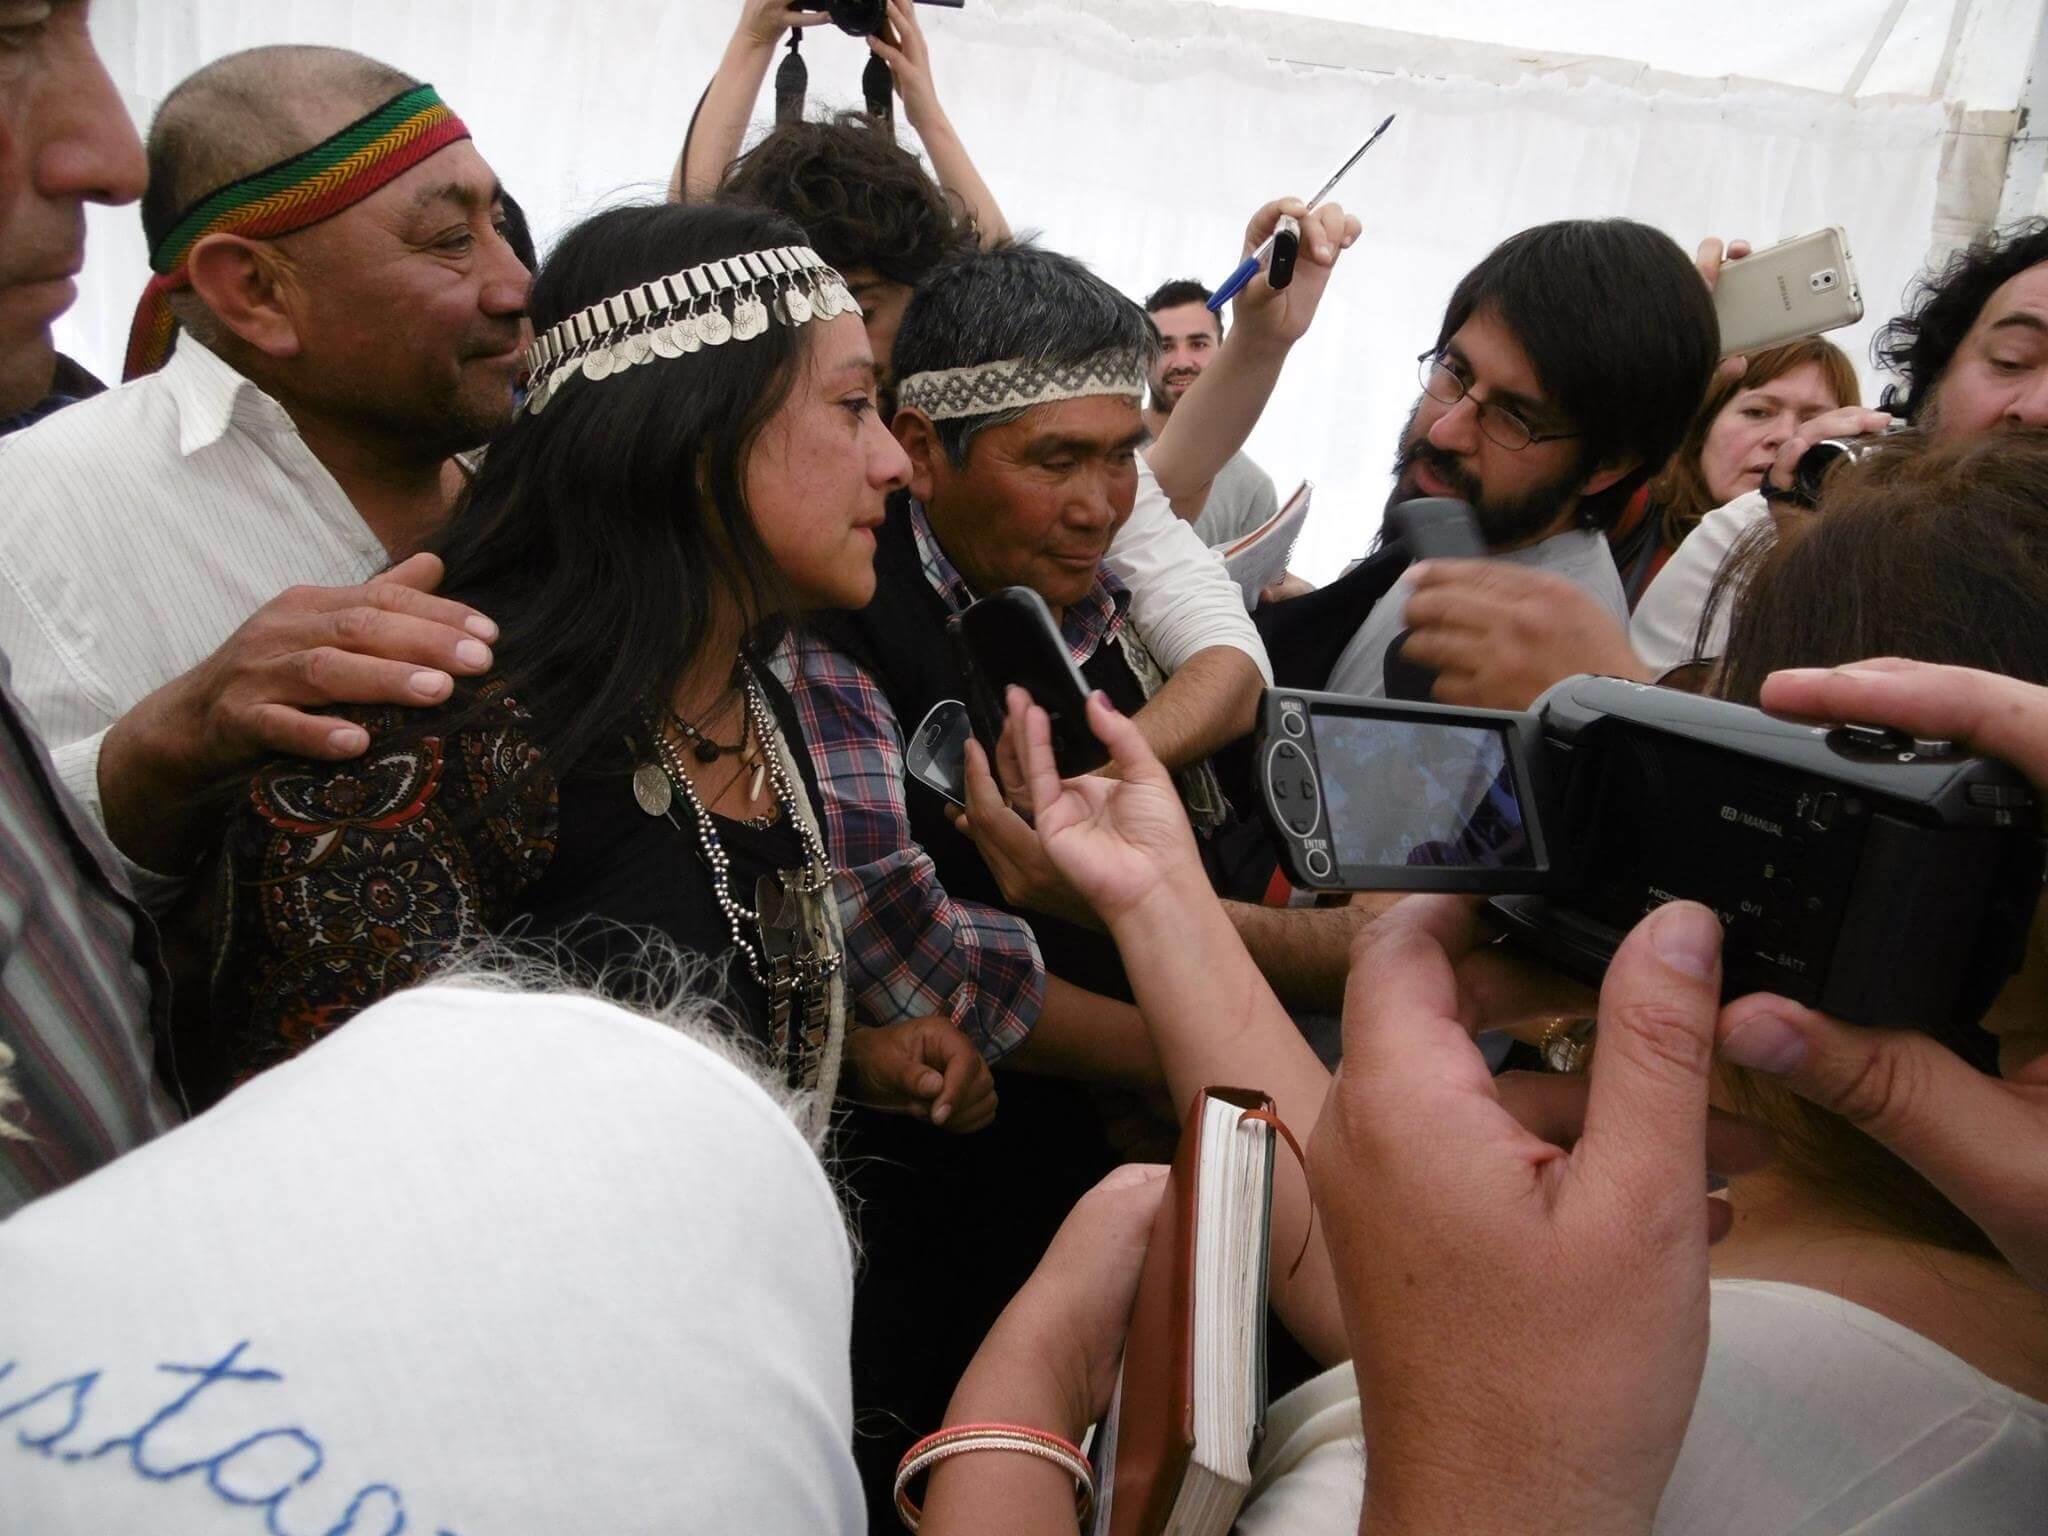 Interviews with the Press (Photo: Ruben Curricoy Nañko)